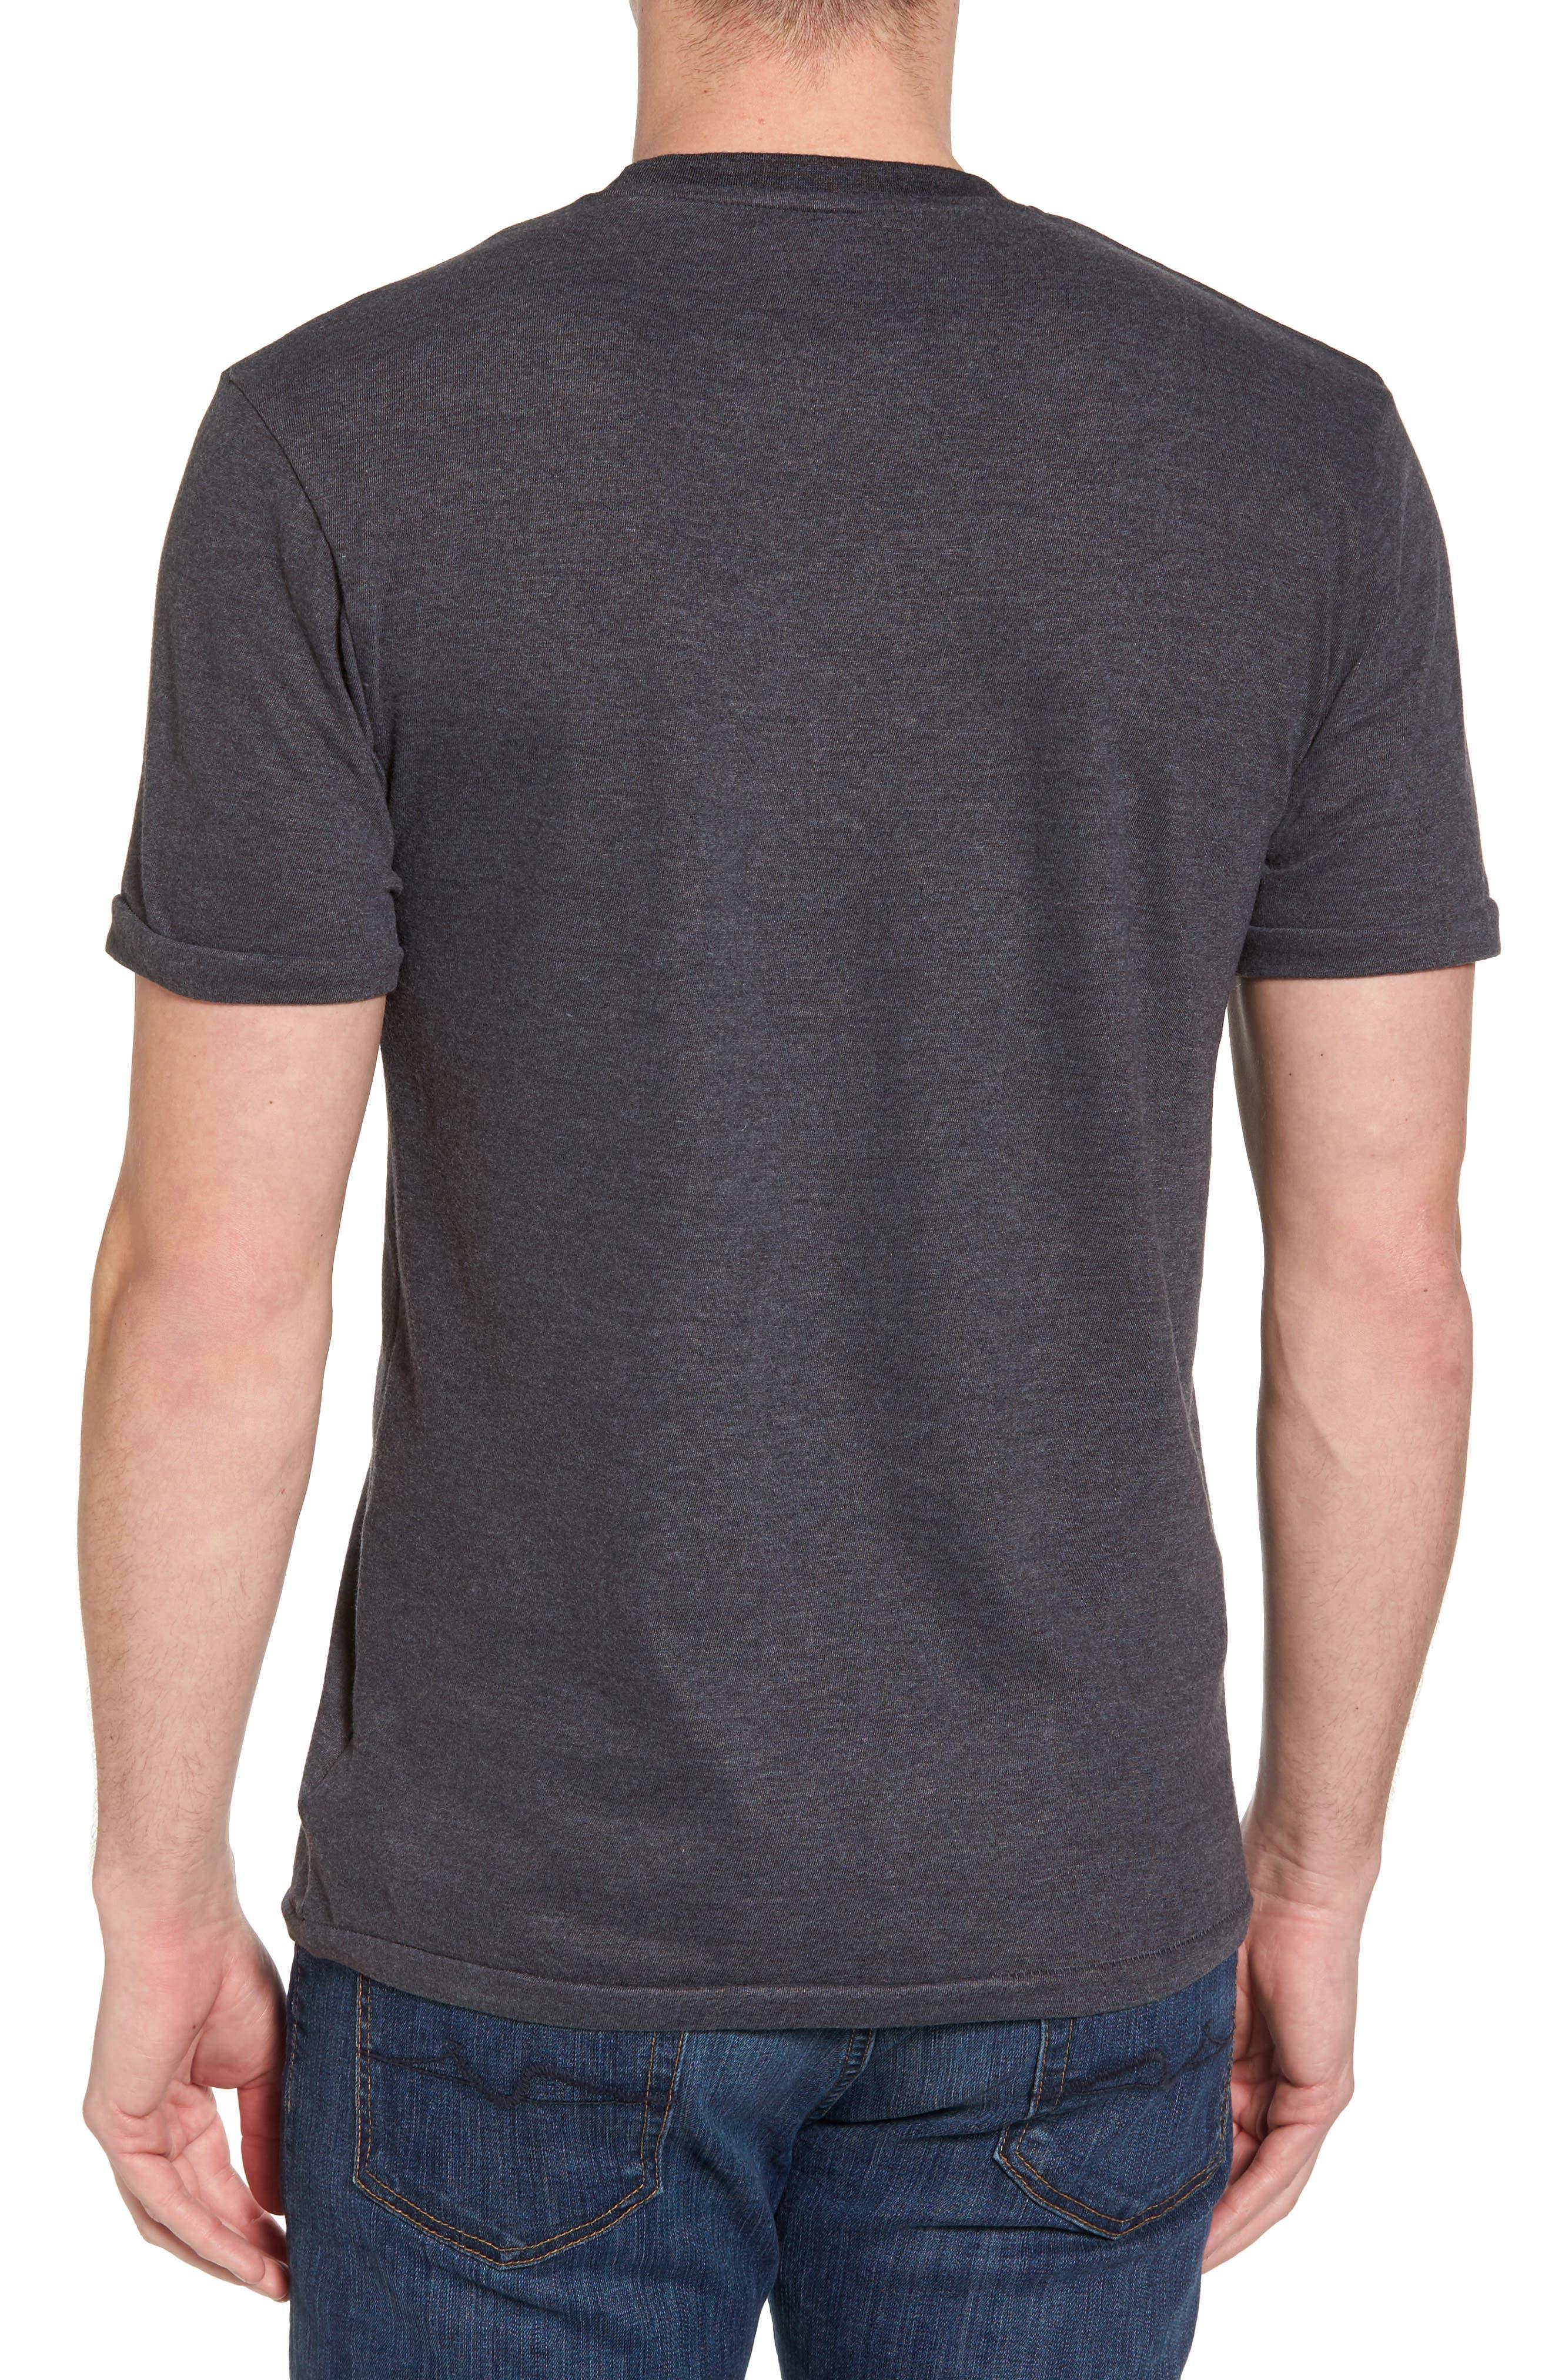 Hillwood Penguins T-Shirt,                             Alternate thumbnail 2, color,                             Heather Black